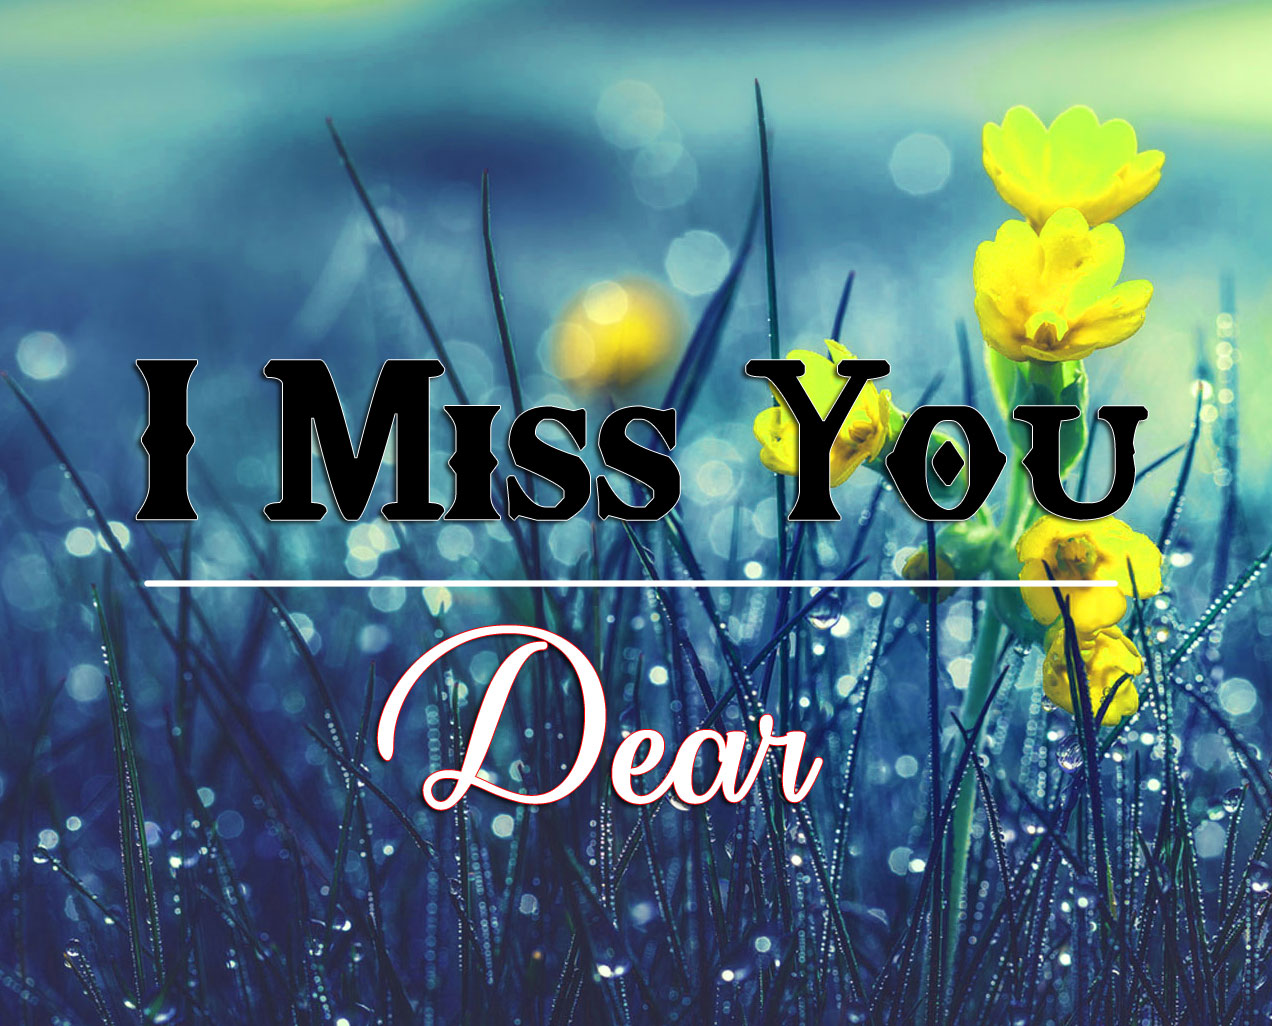 Dear HD I miss you Images